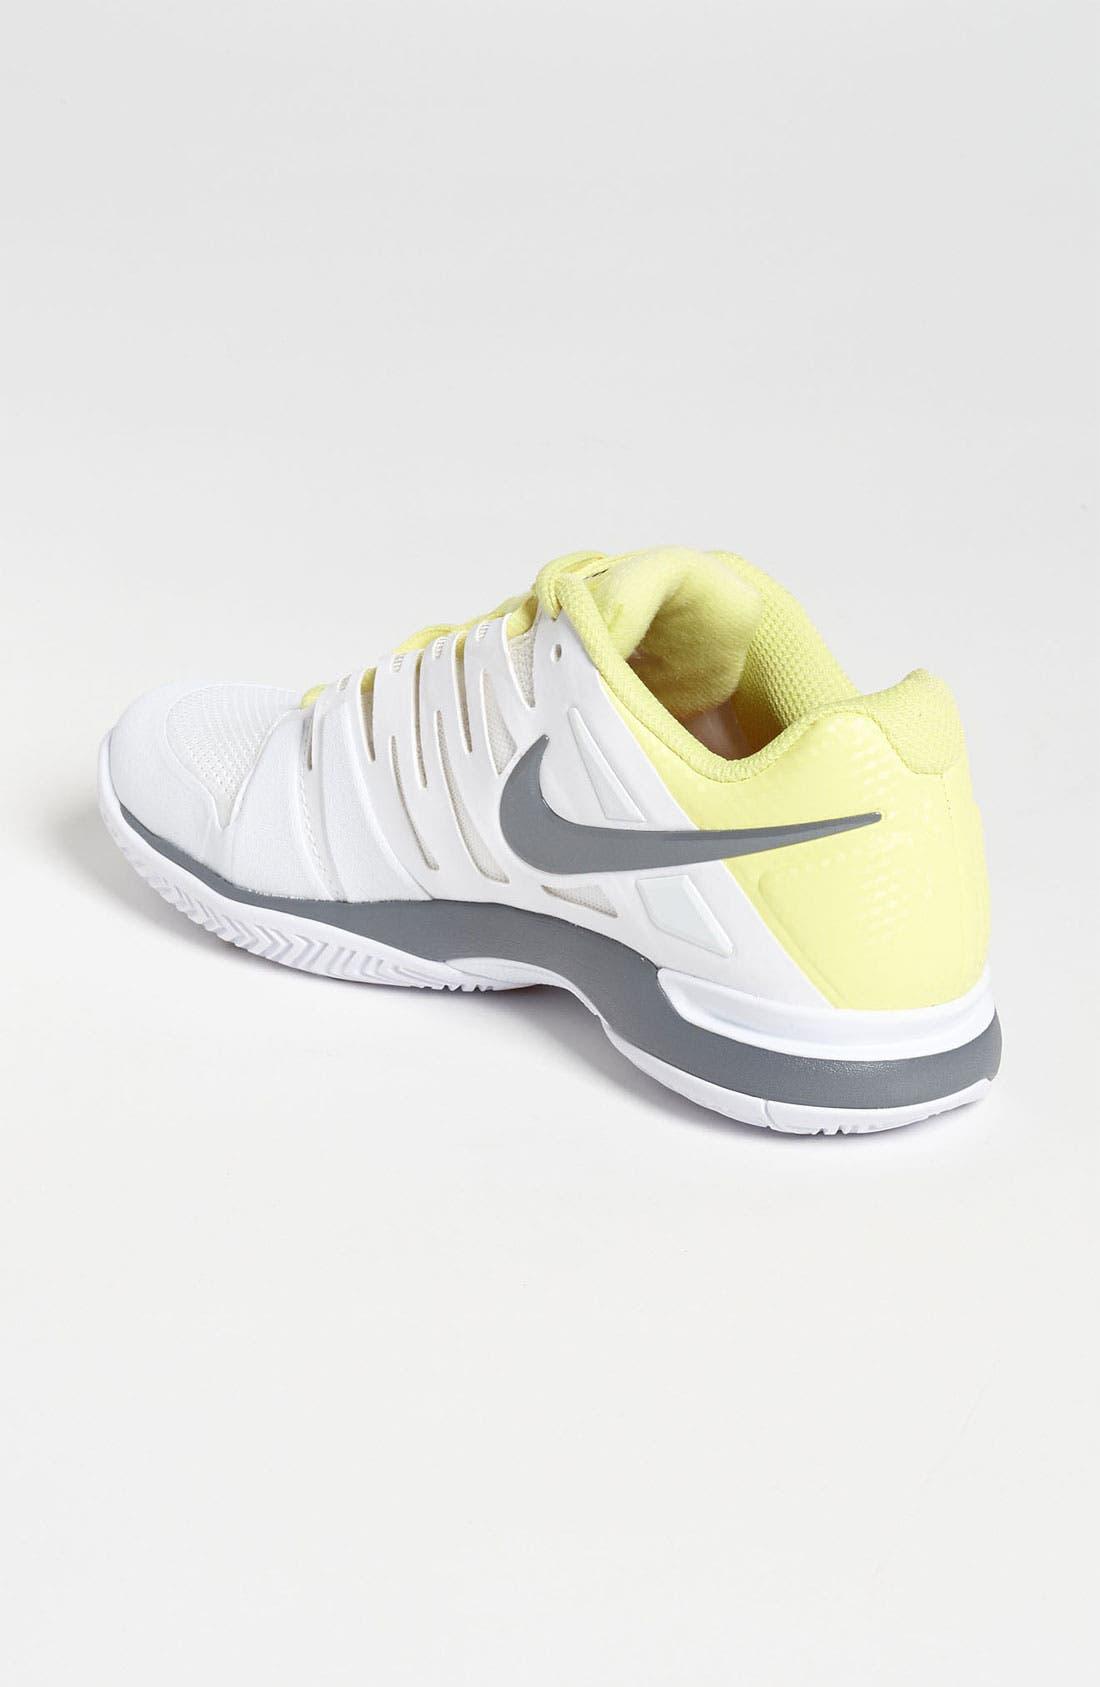 NIKE,                             'Zoom Vapor 9 Tour' Tennis Shoe,                             Alternate thumbnail 4, color,                             107